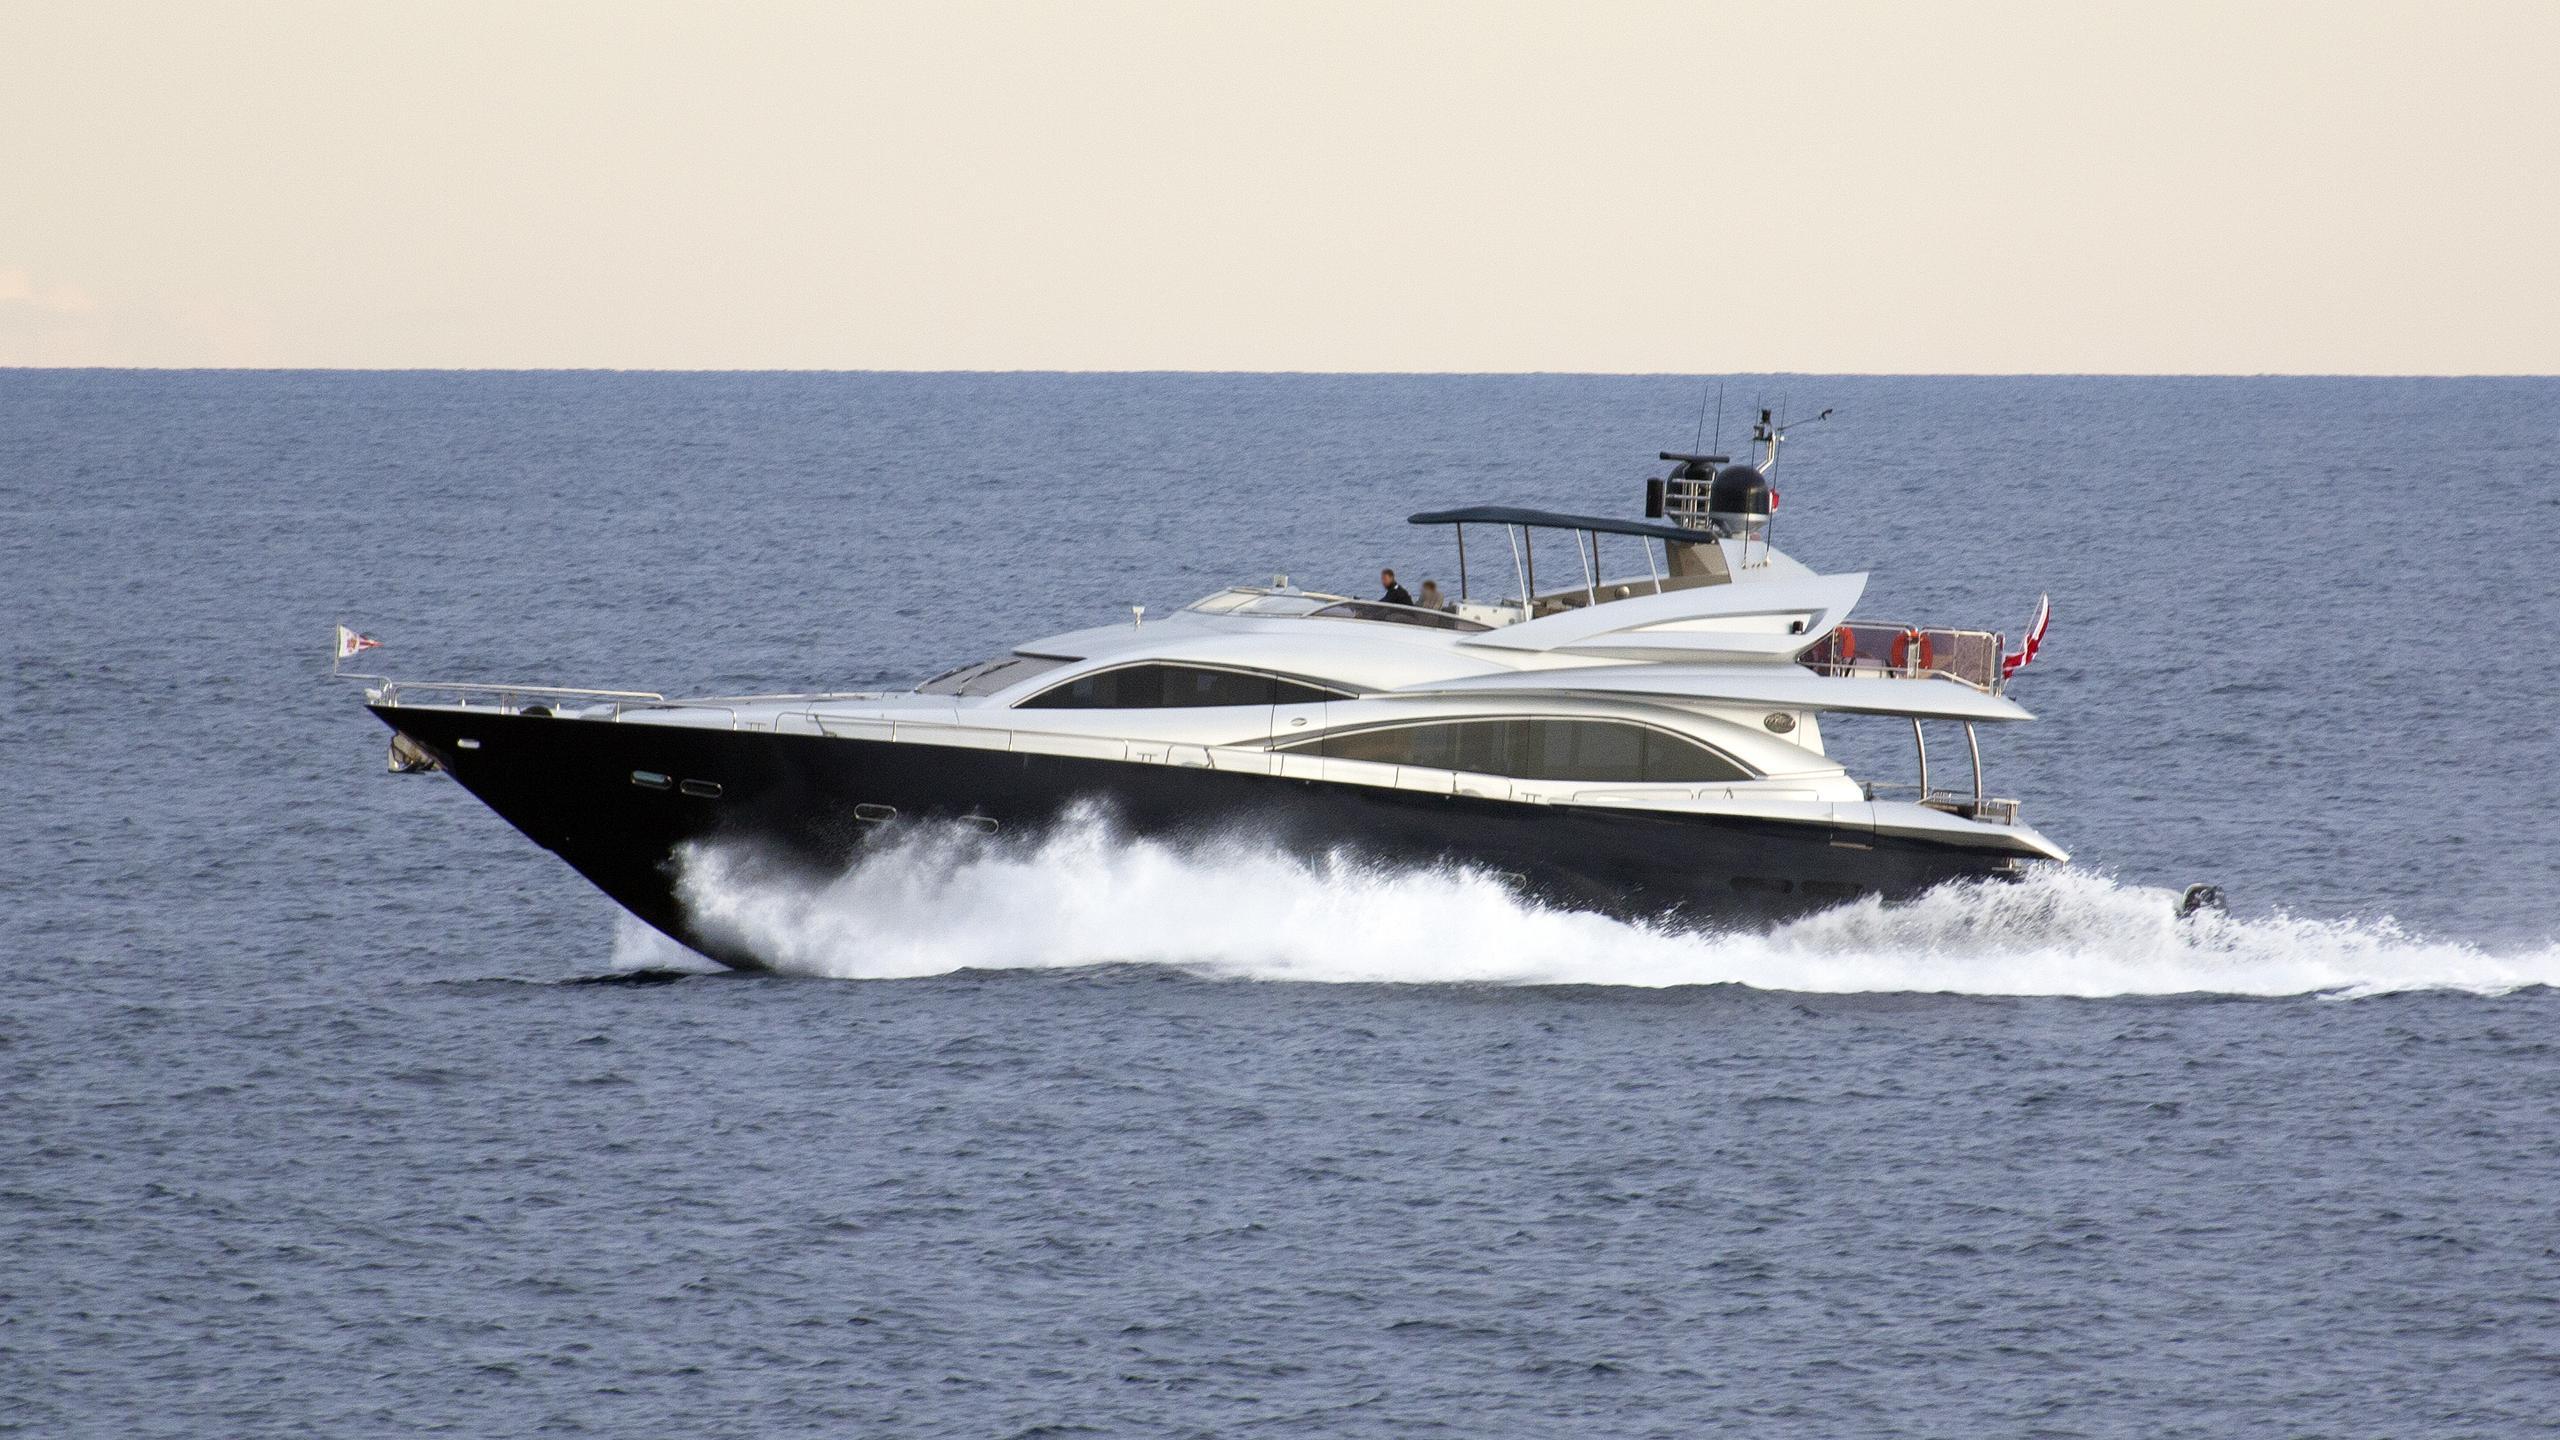 georgina-motor-yacht-Sunseeker-90-2009-28m-cruising